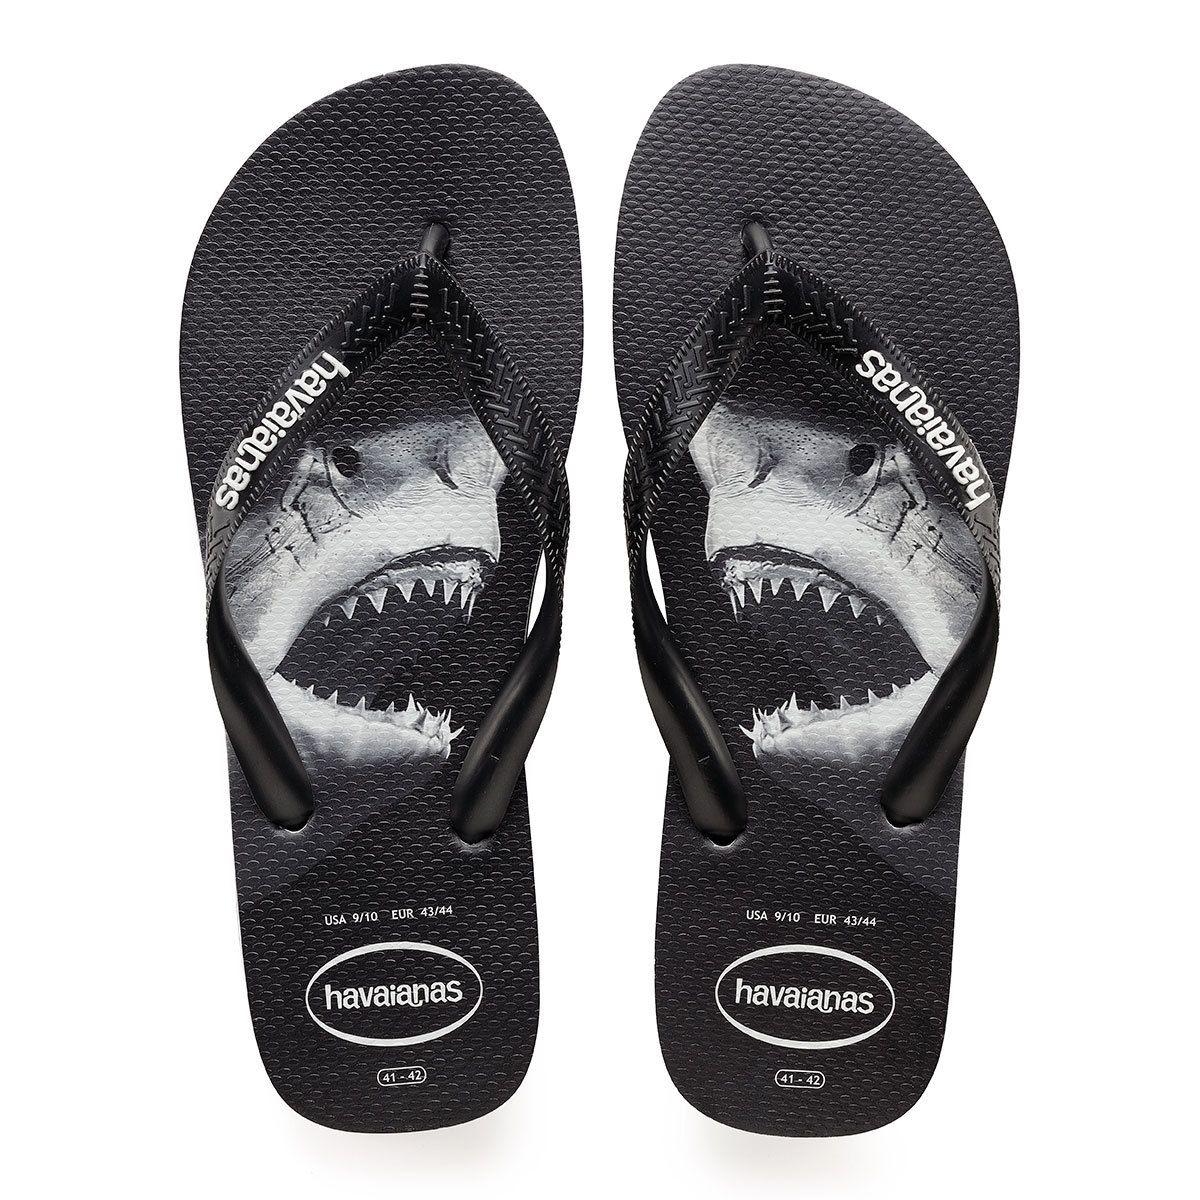 Toe post Havaianas Top Photoprint Black//White Thong Sandals  Men/'s